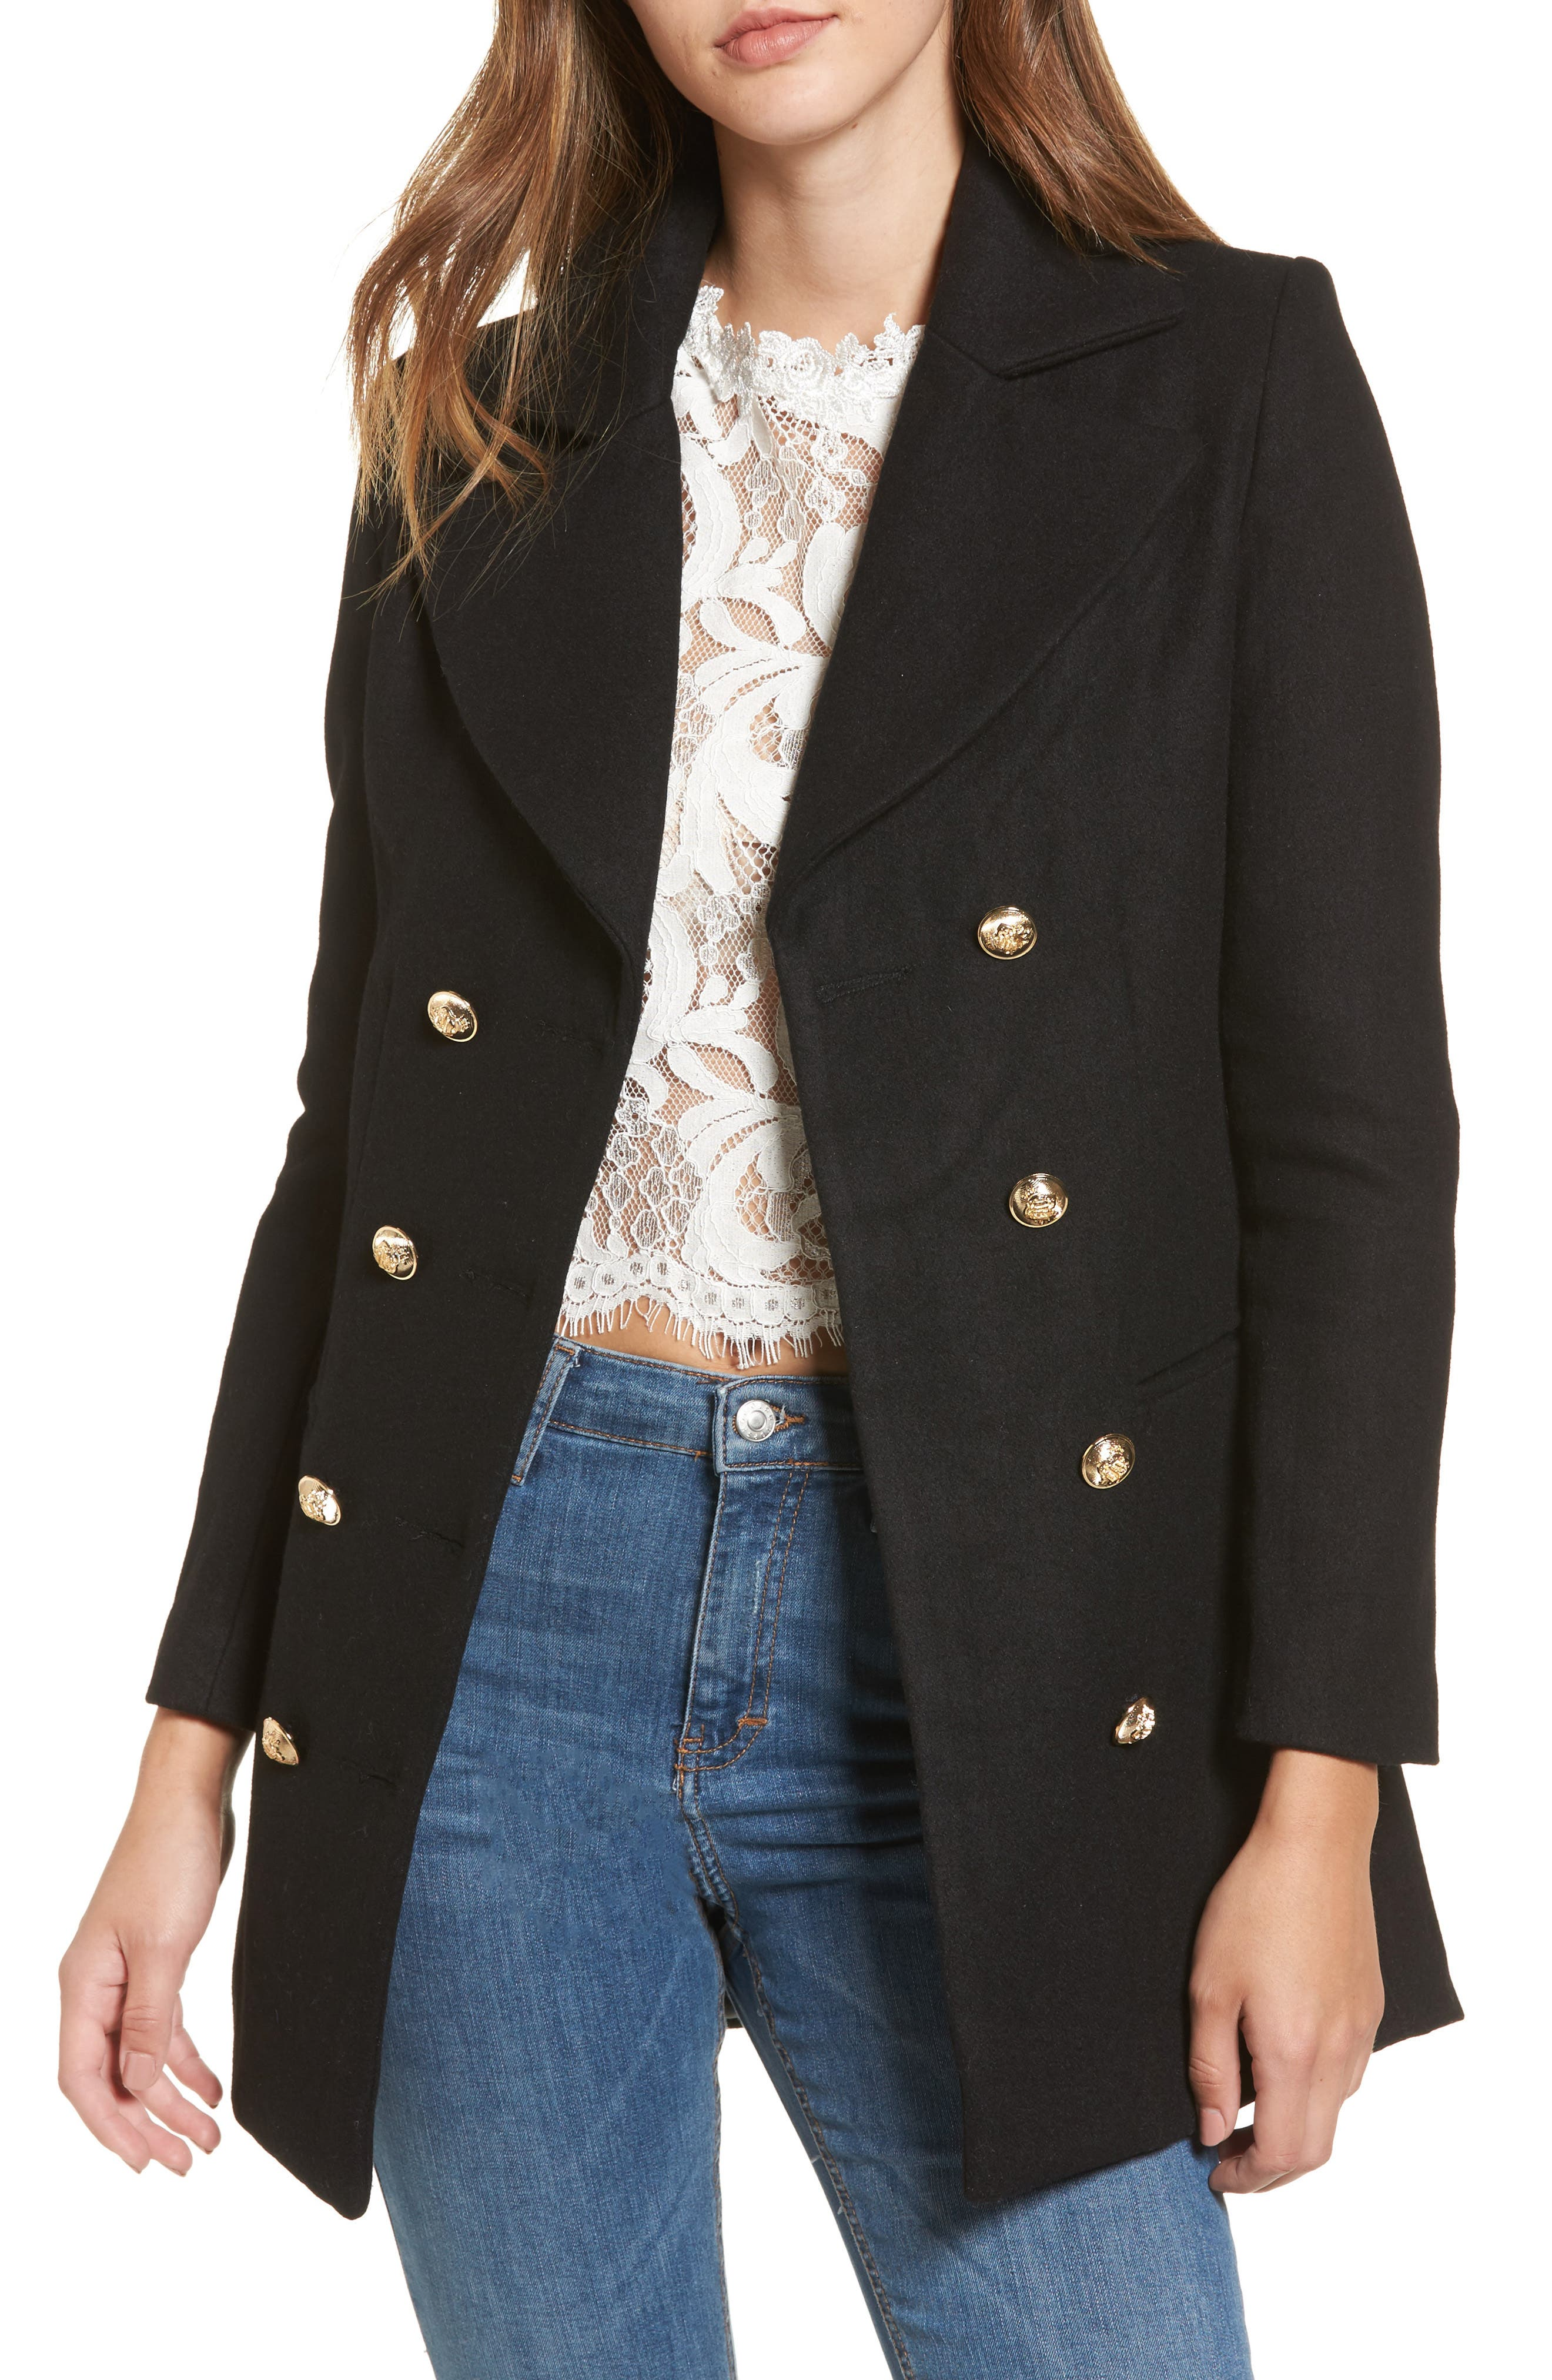 Main Image - Lioness Bad Romance Blazer Jacket